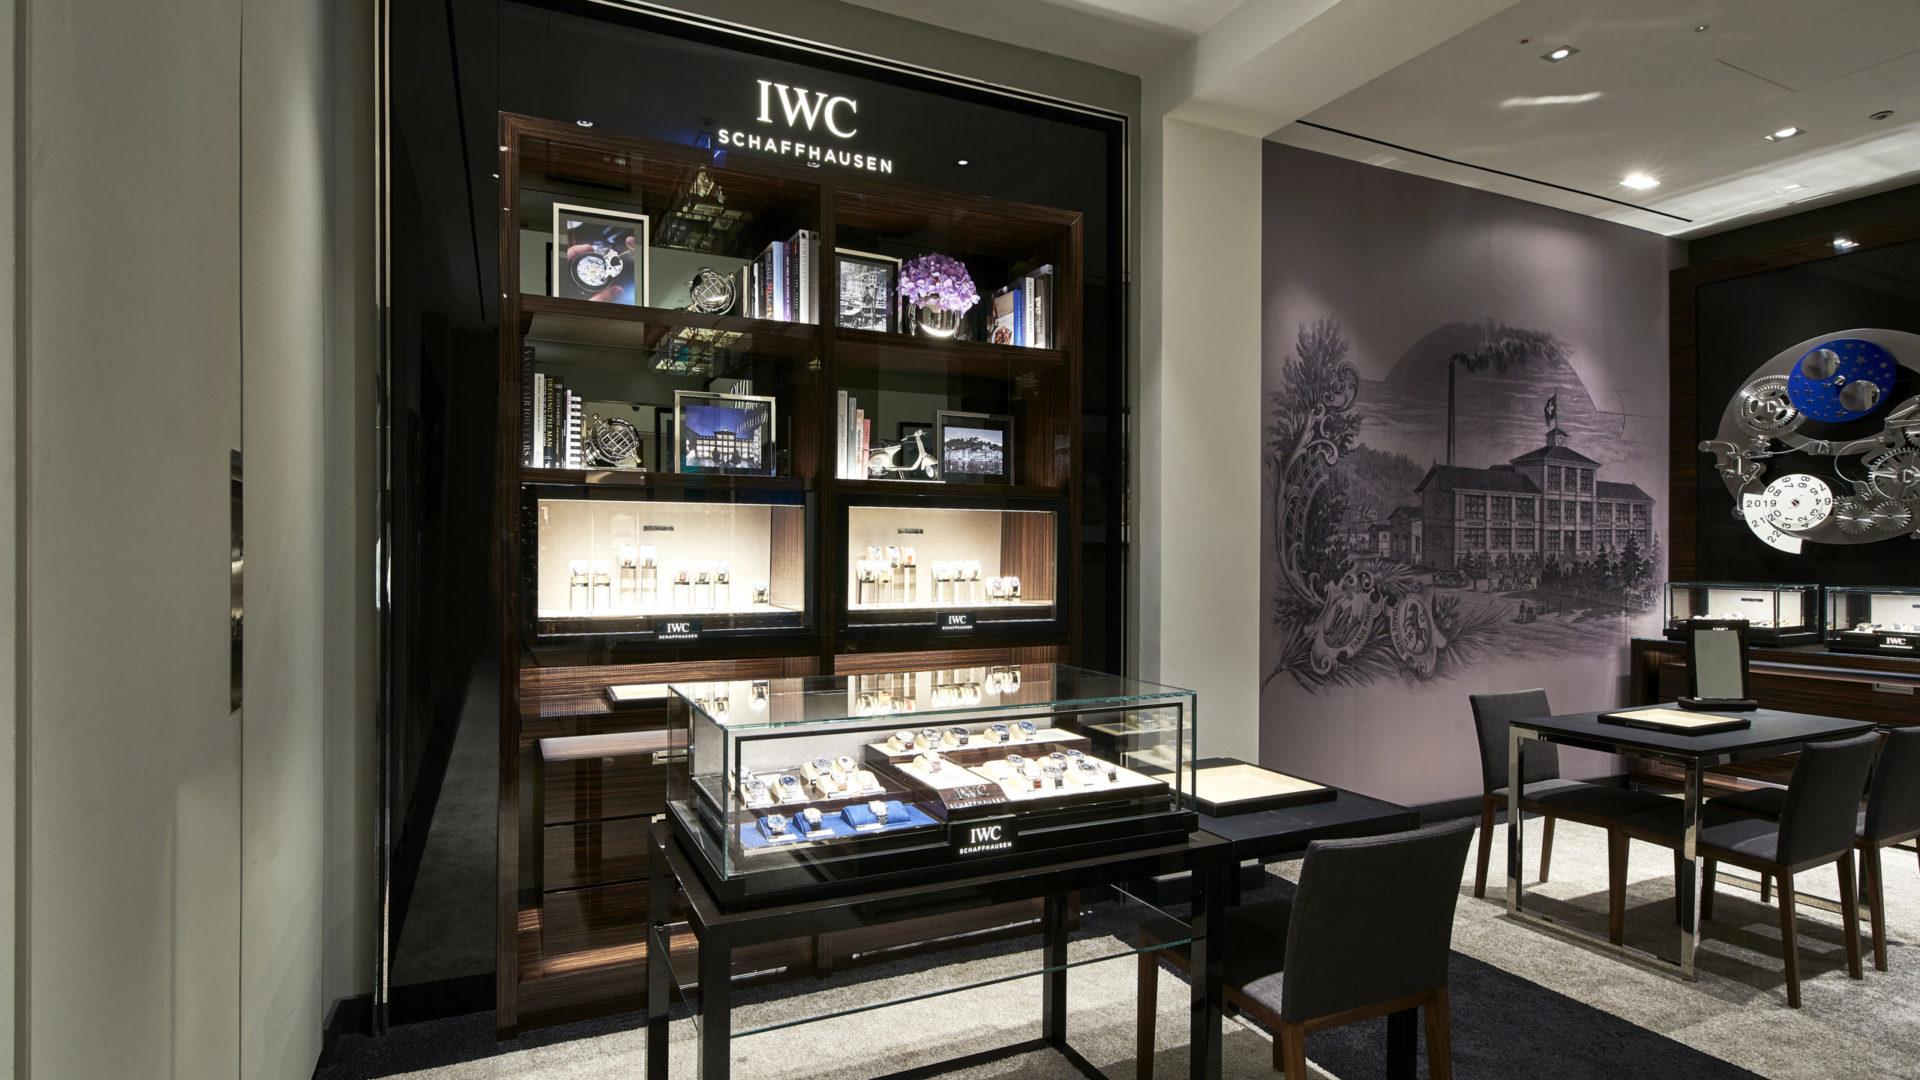 WoS Regent Street 461 IWC 50